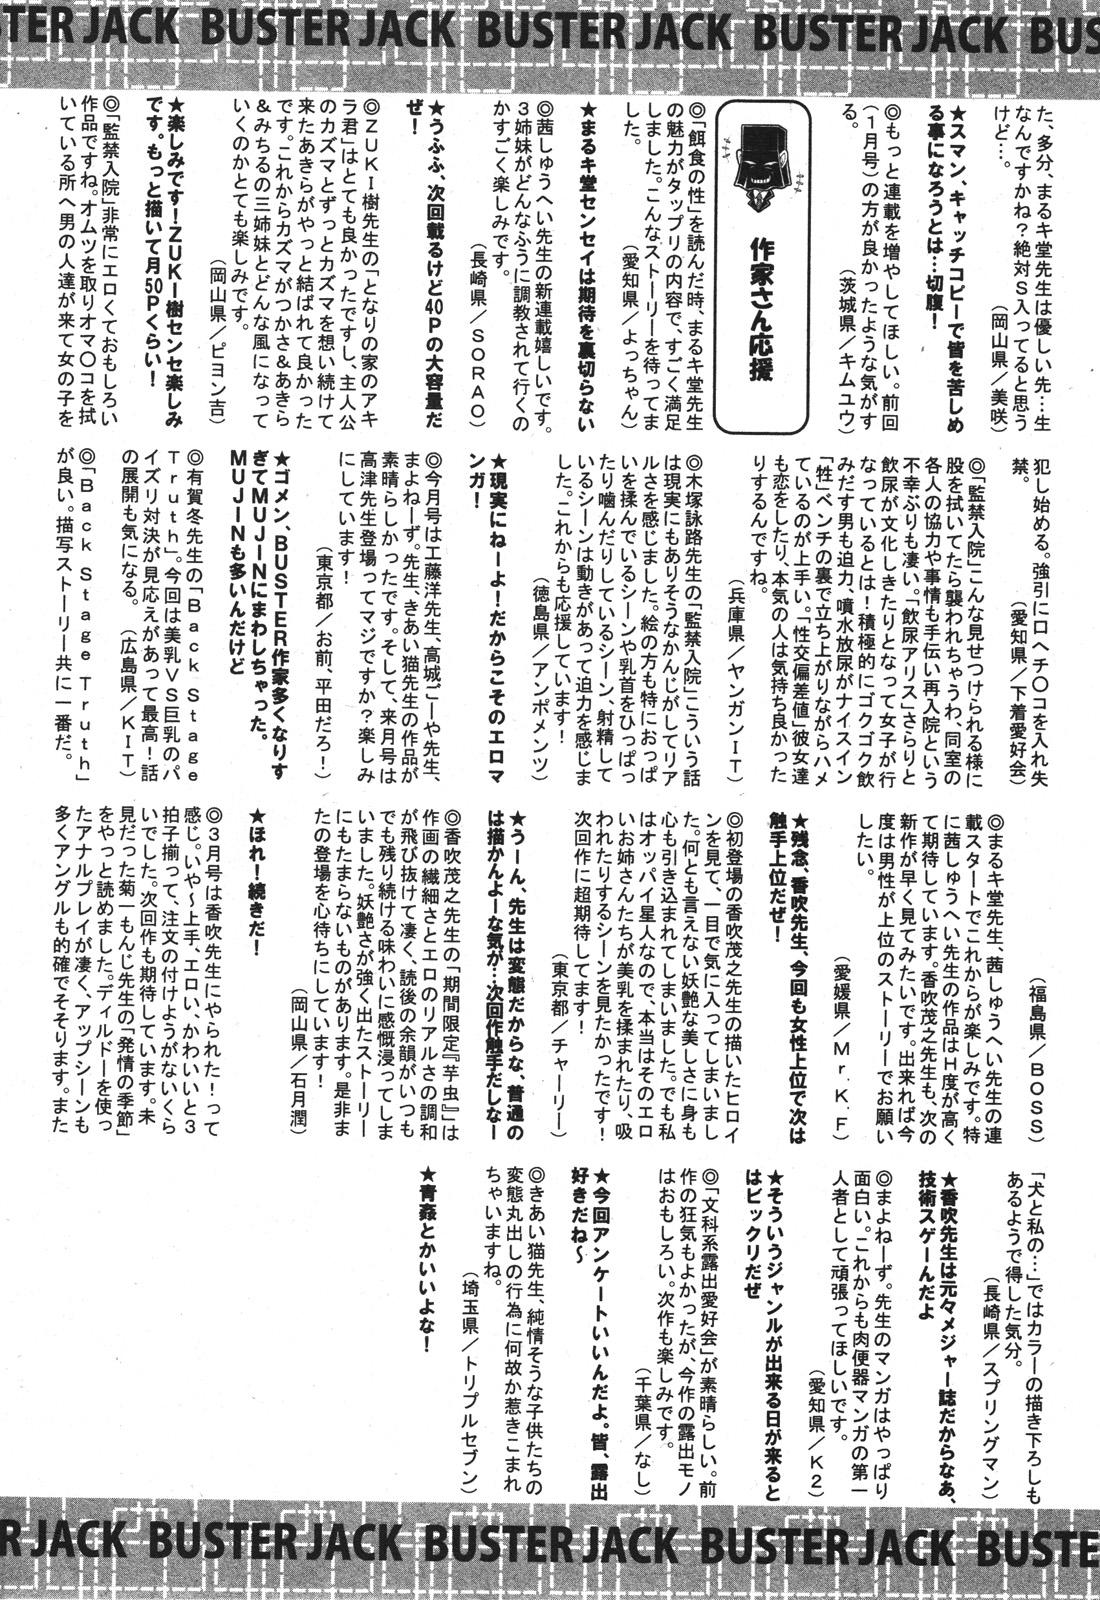 BUSTER COMIC 2010-05 Vol.07 479